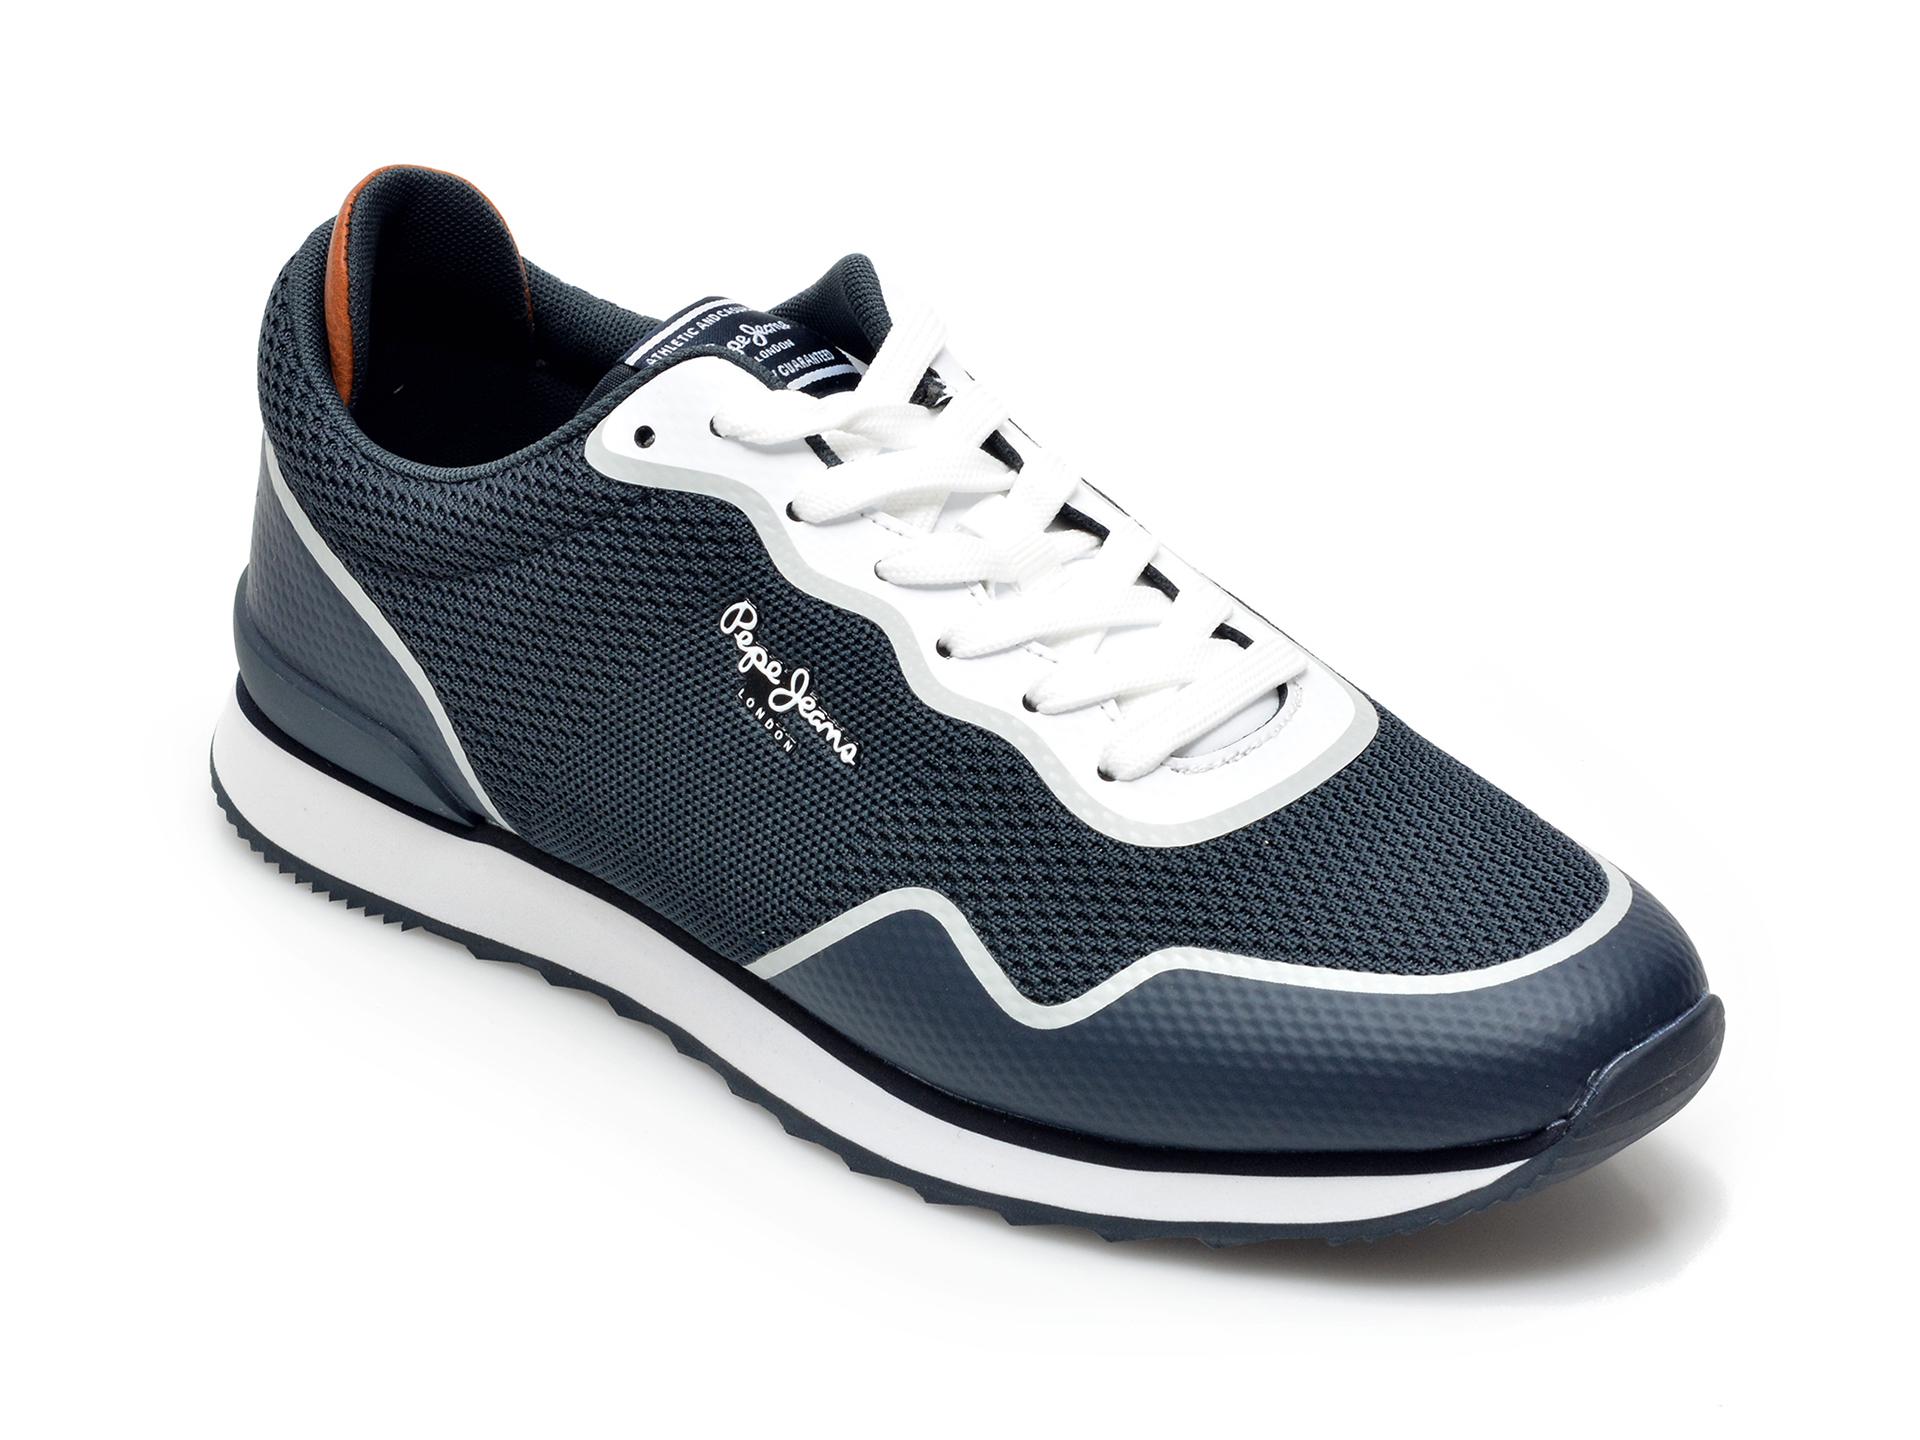 Pantofi sport PEPE JEANS bleumarin, 3070699, din material textil si piele ecologica imagine otter.ro 2021